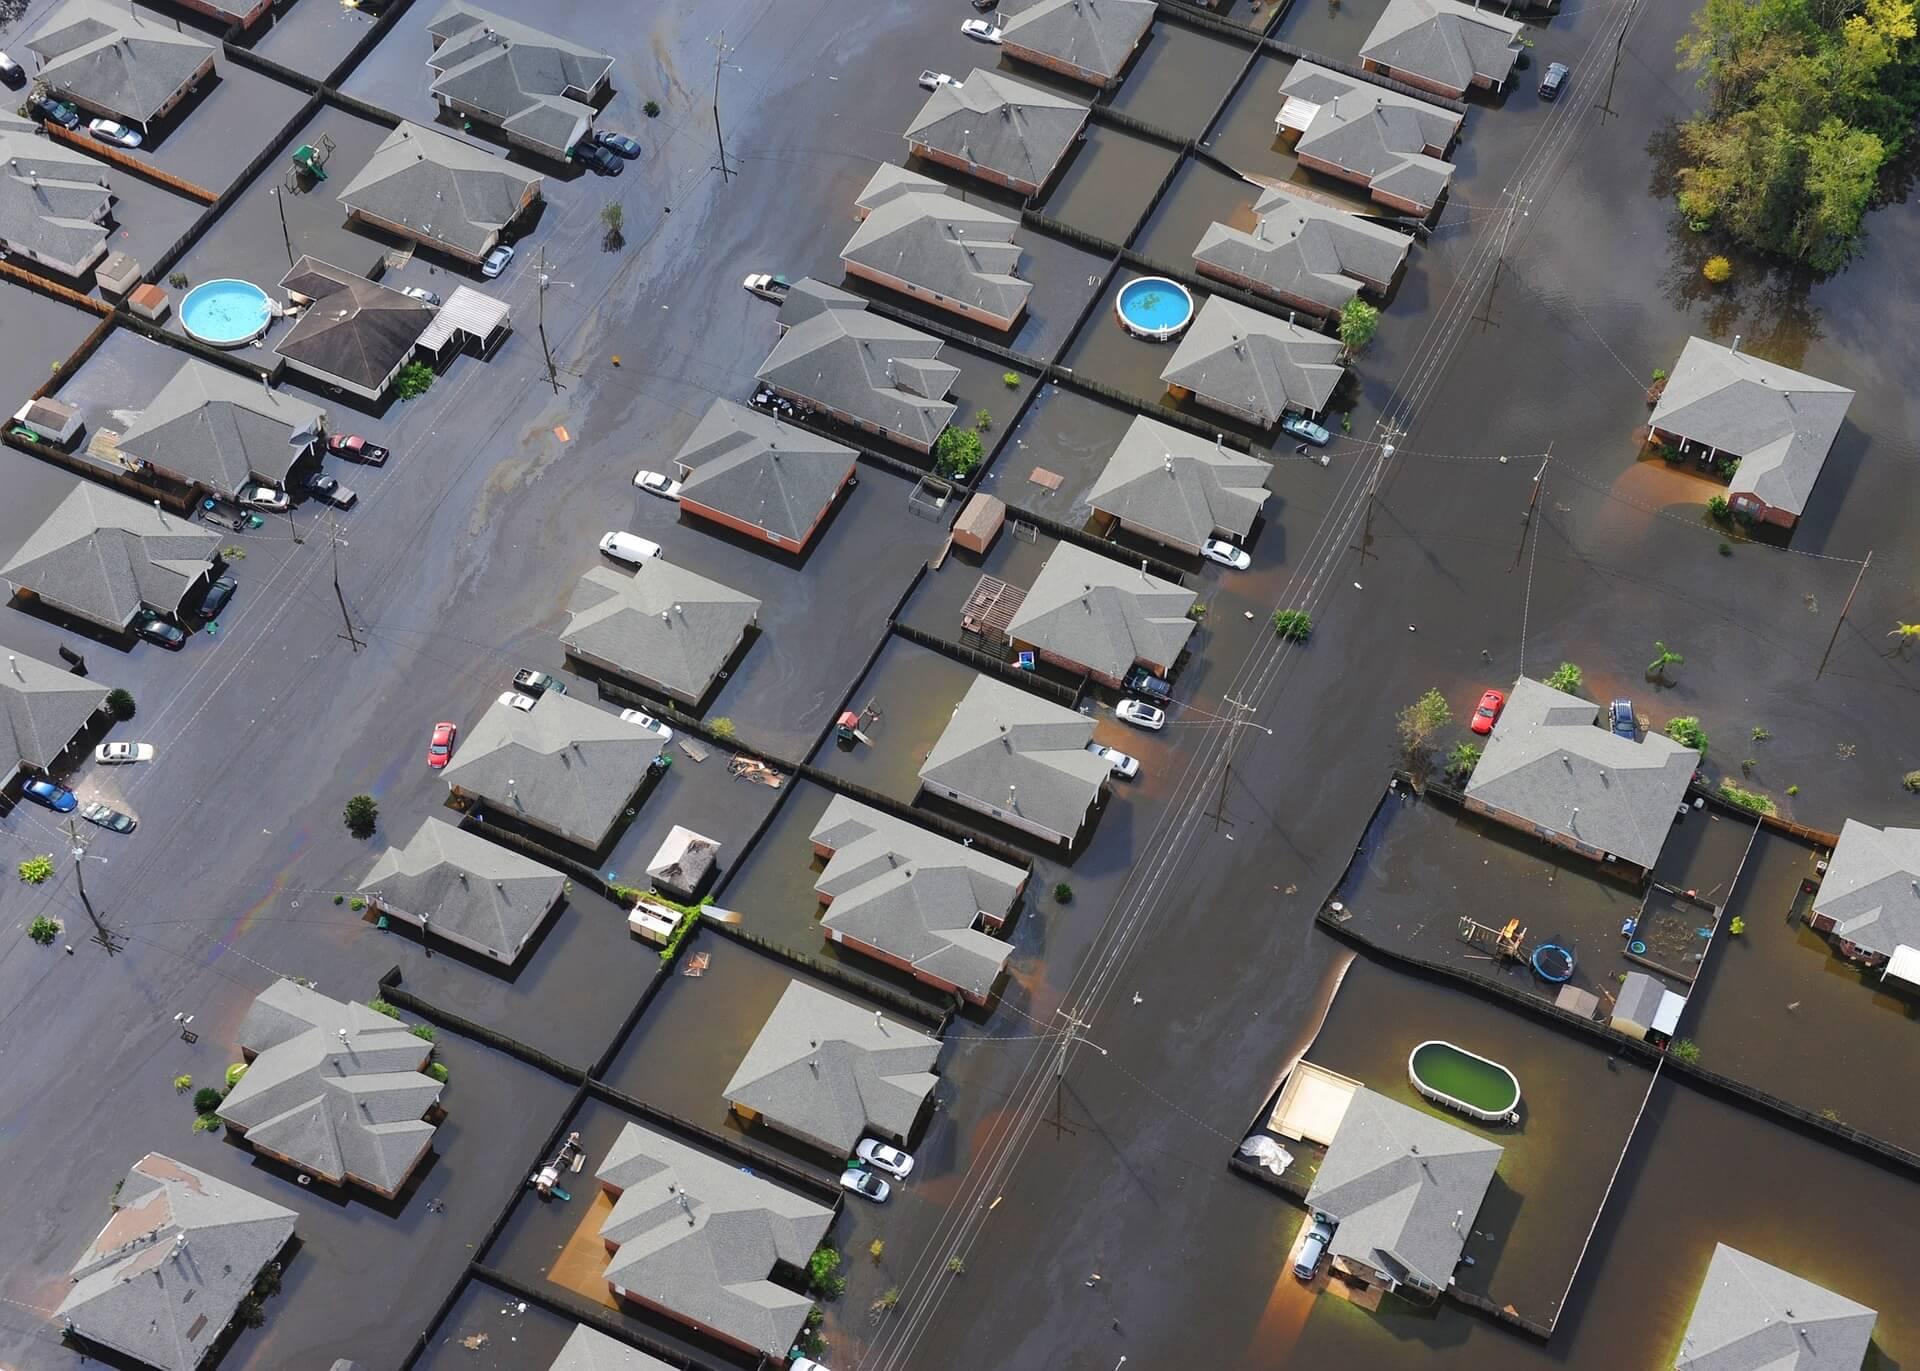 aerial shot of flooded suburban neighborhood